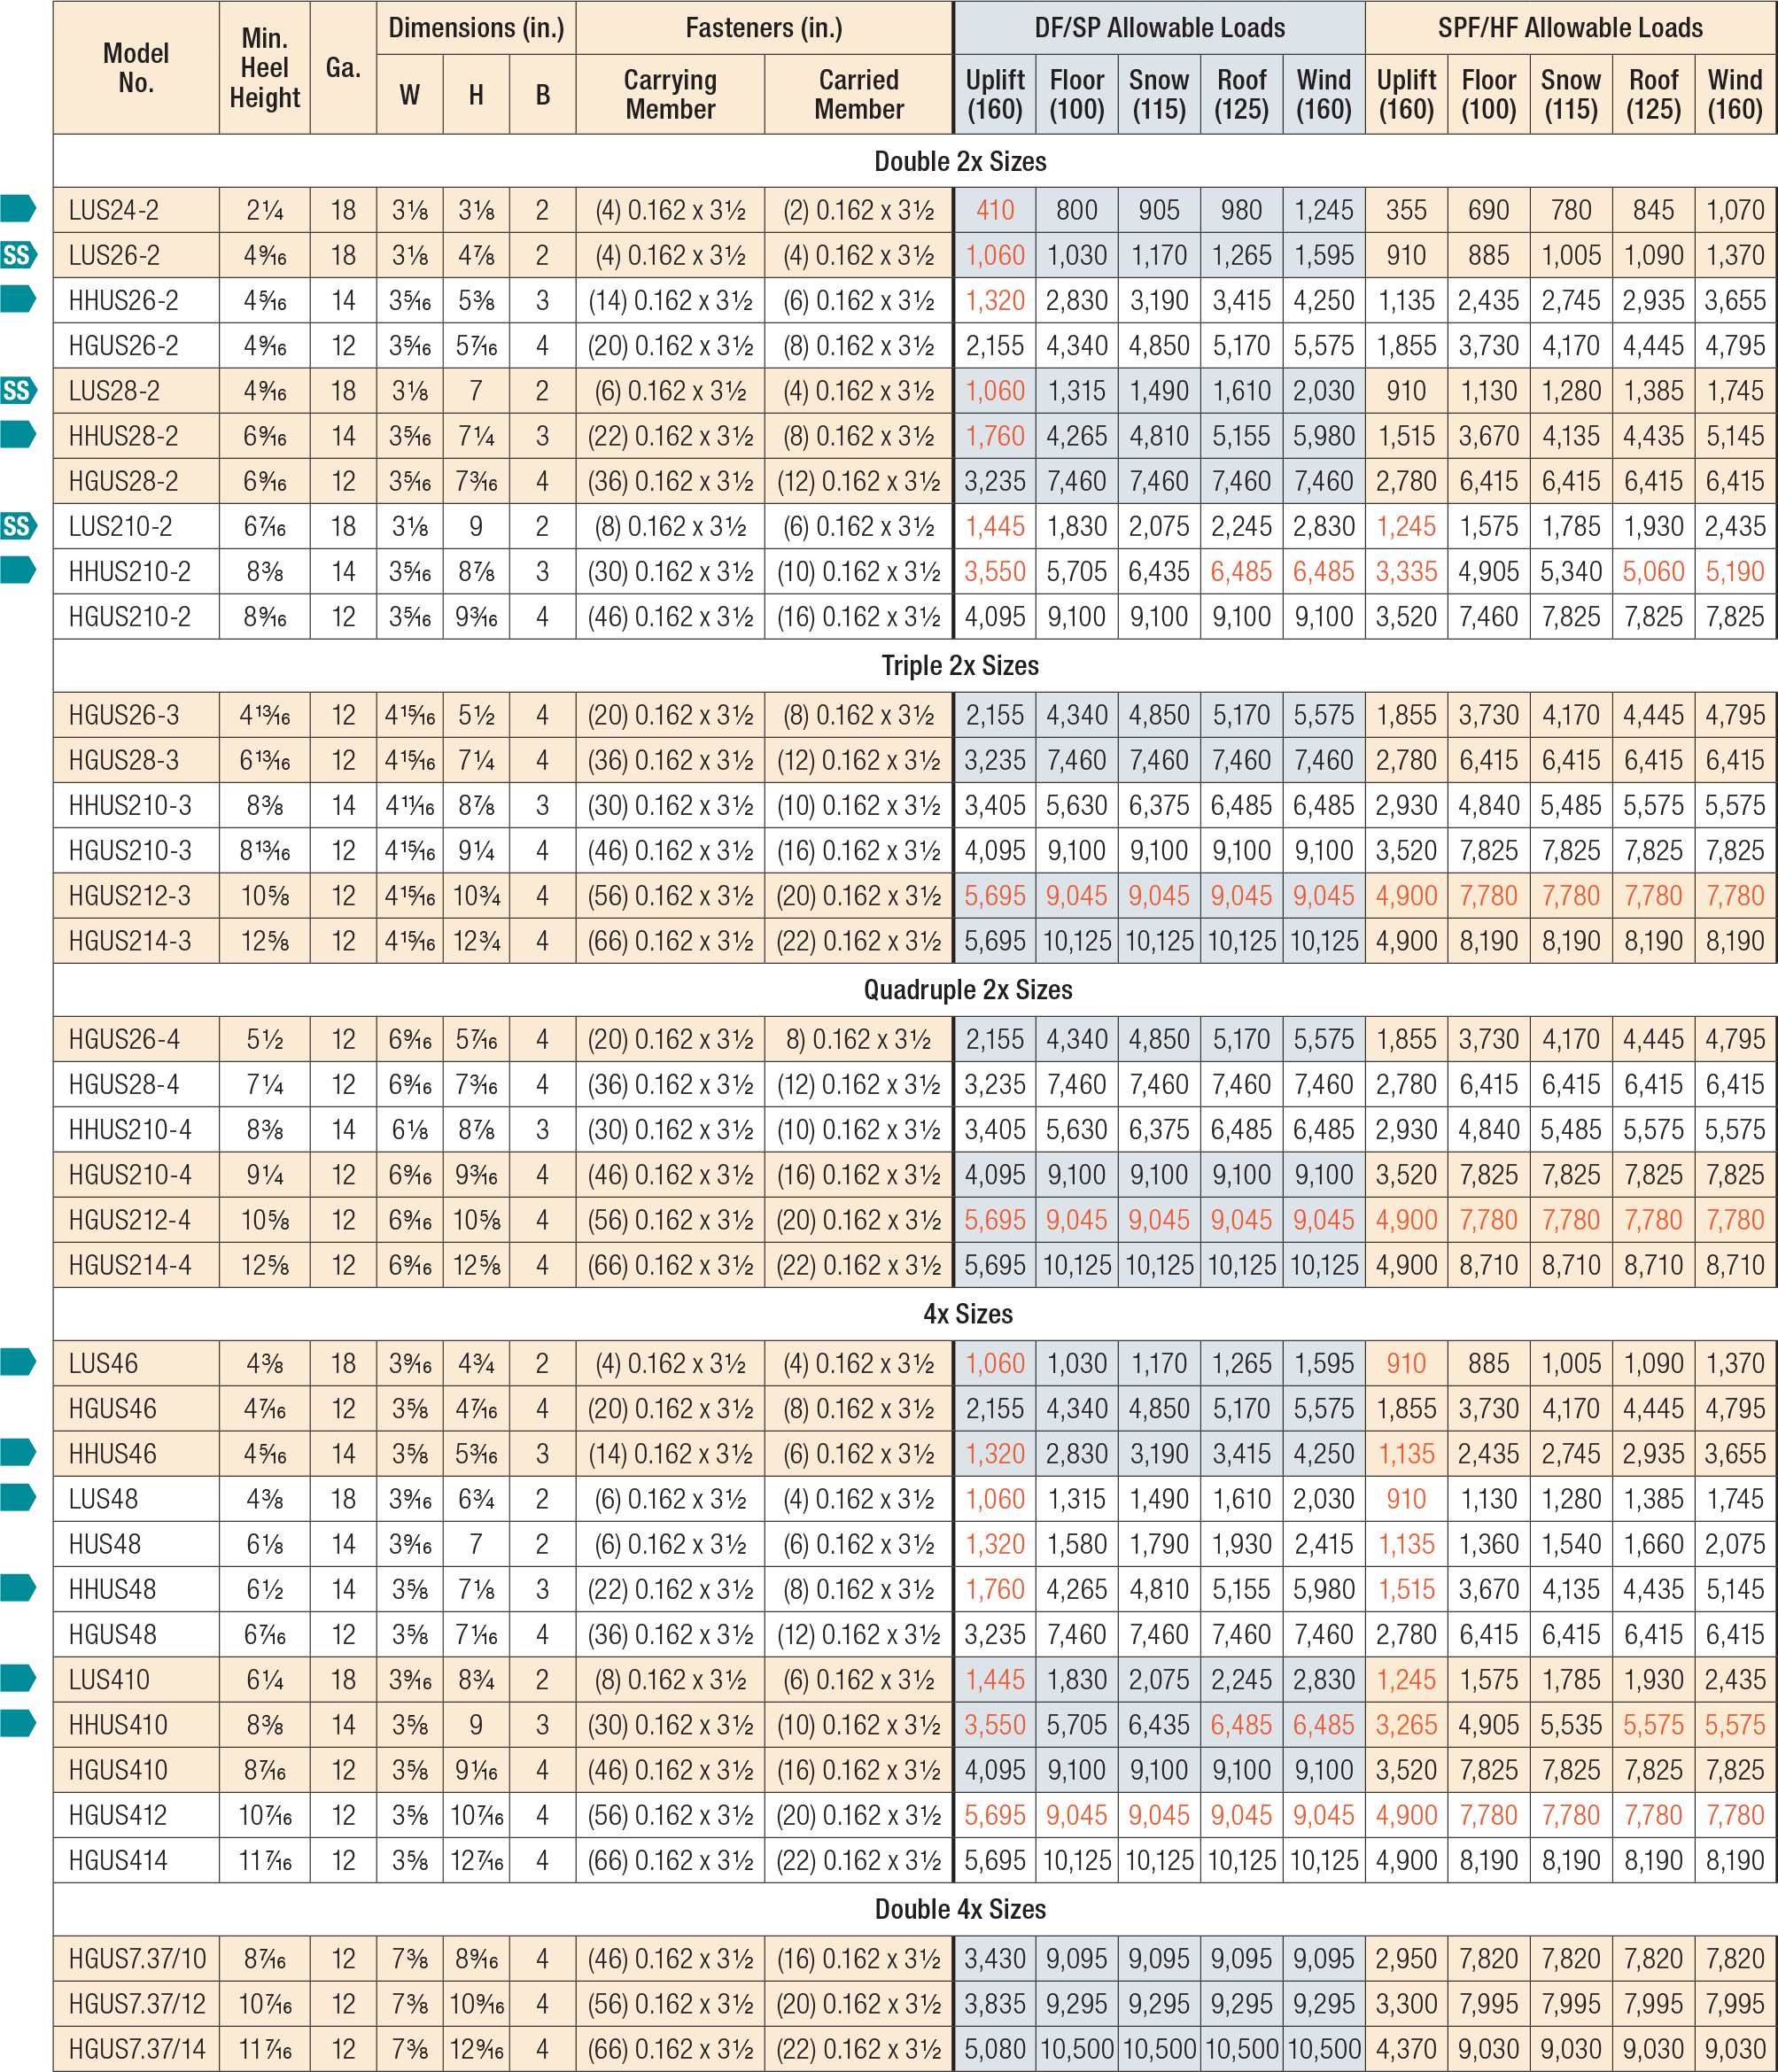 LUS/MUS/HUS/HHUS/HGUS Load Table